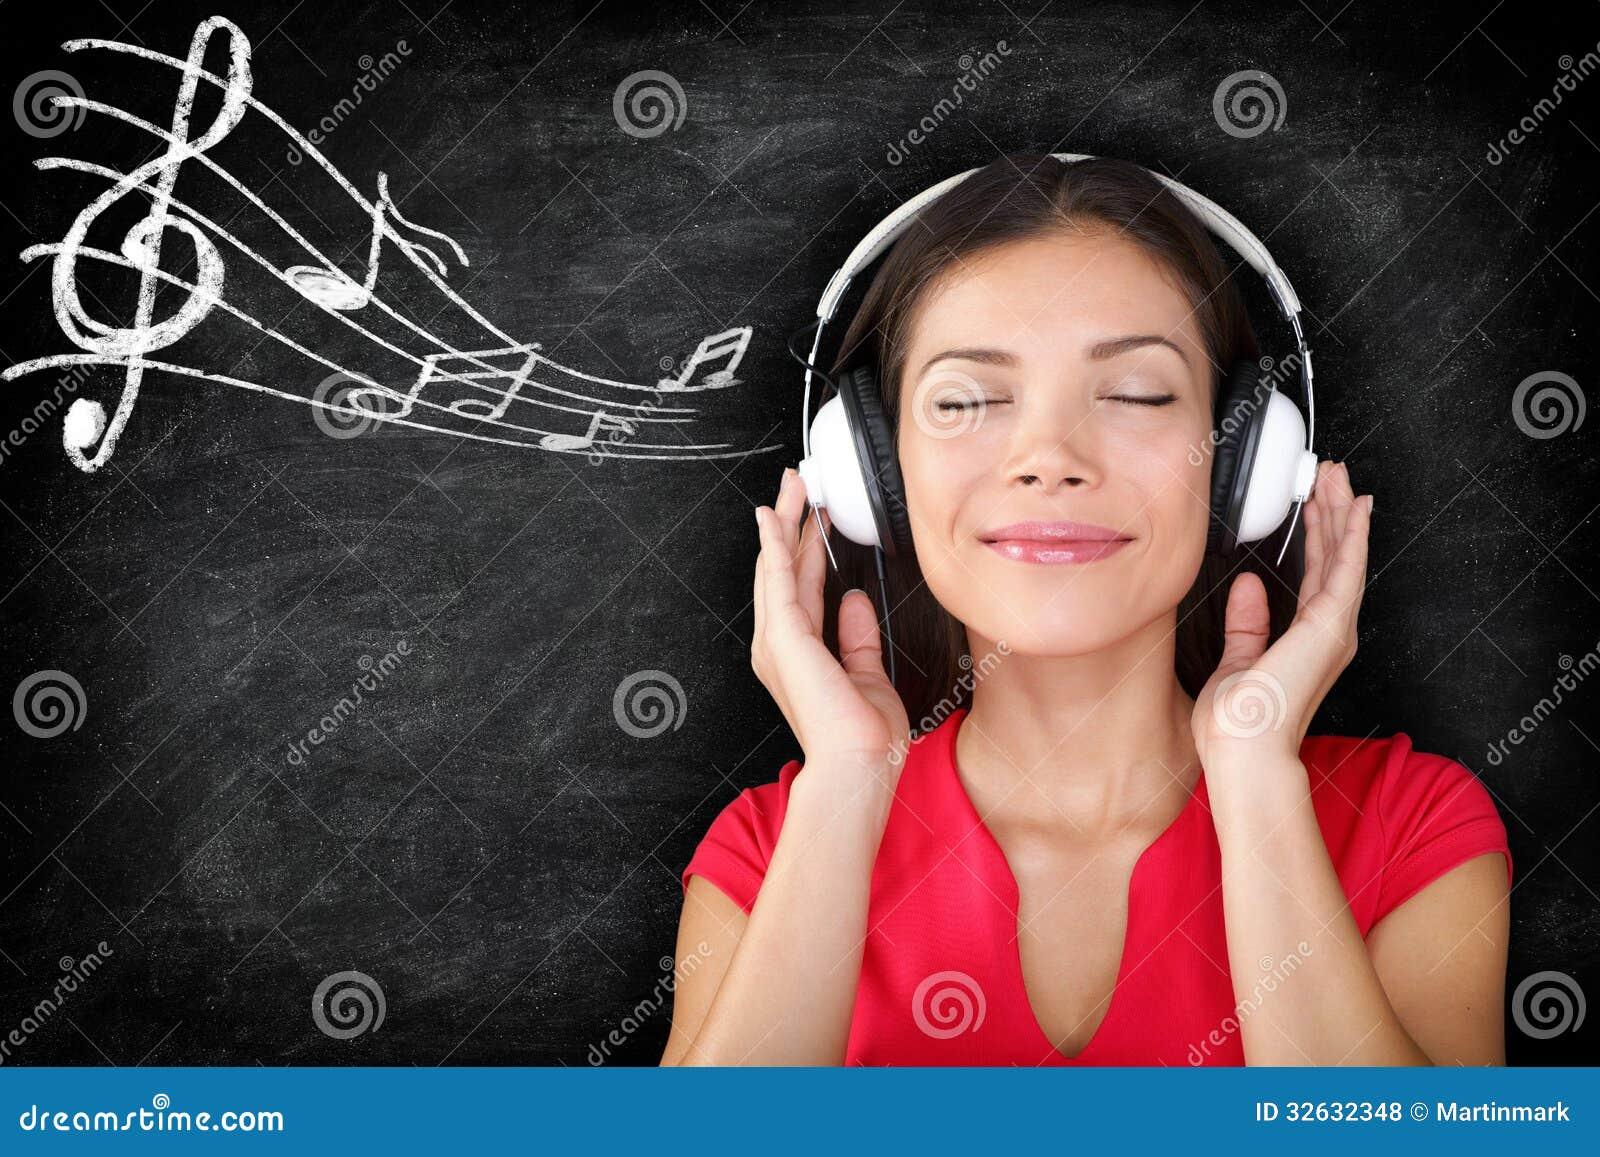 Music - woman wearing headphones listening to music